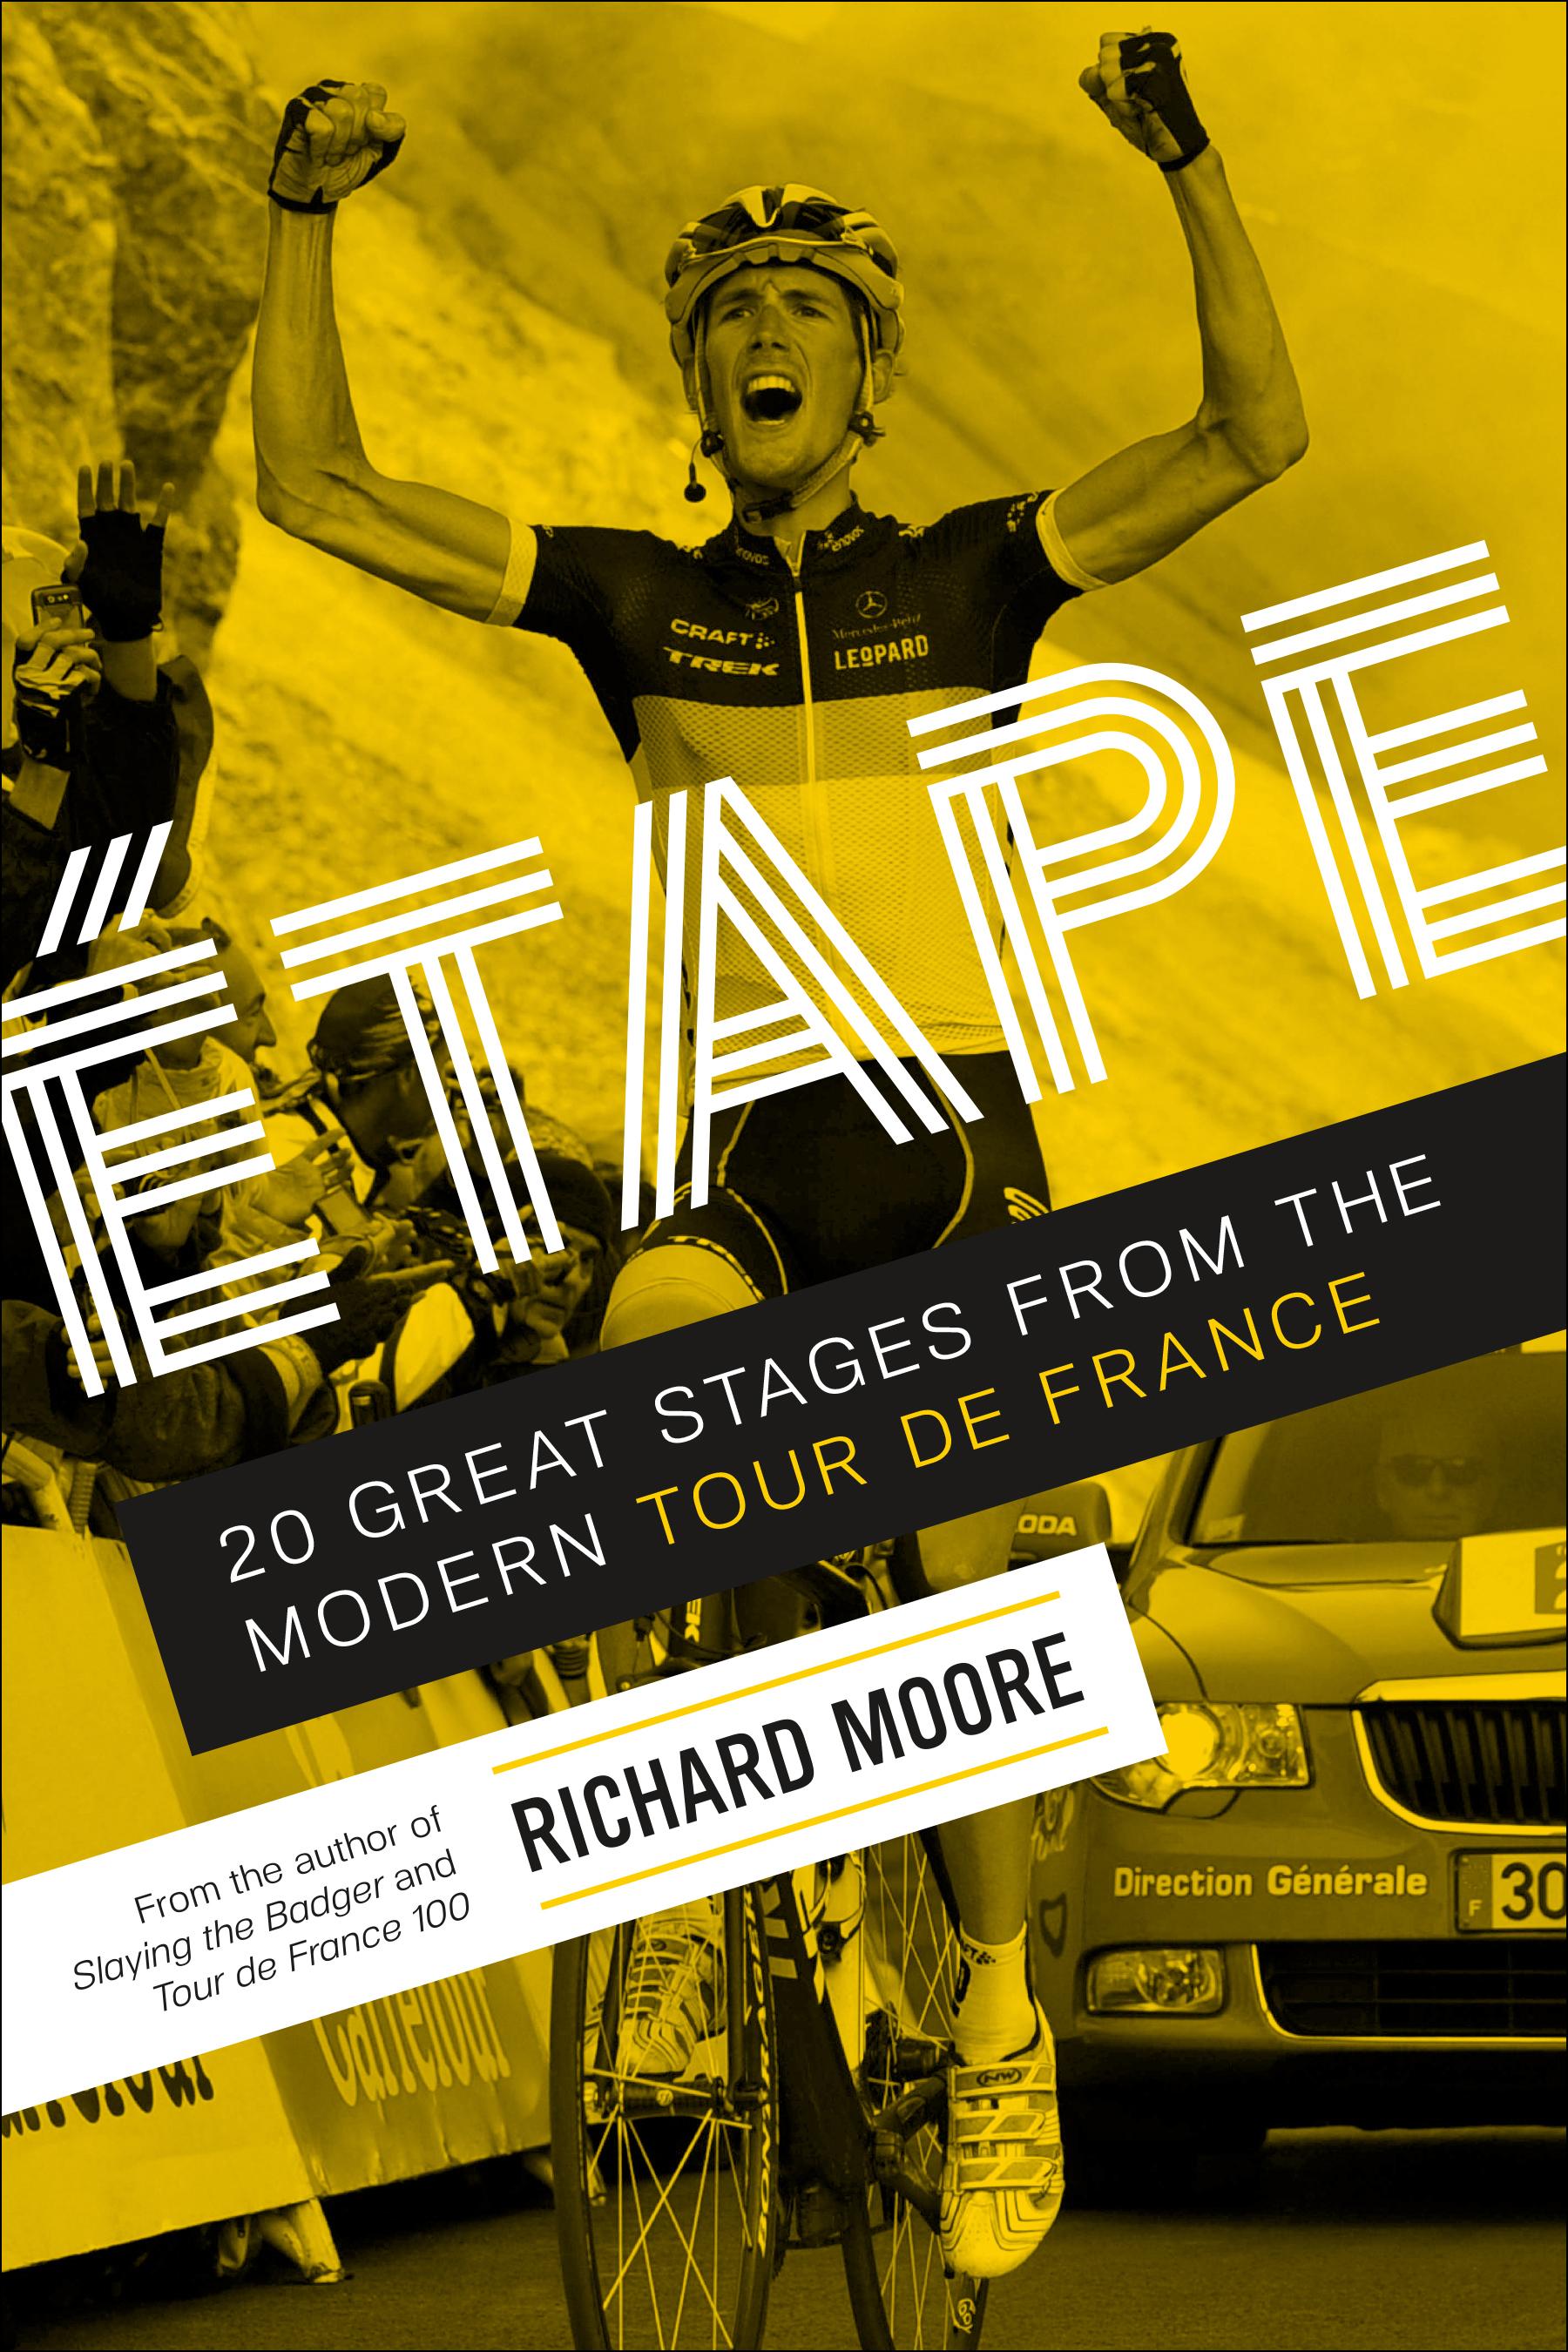 Etape by Richard Moore